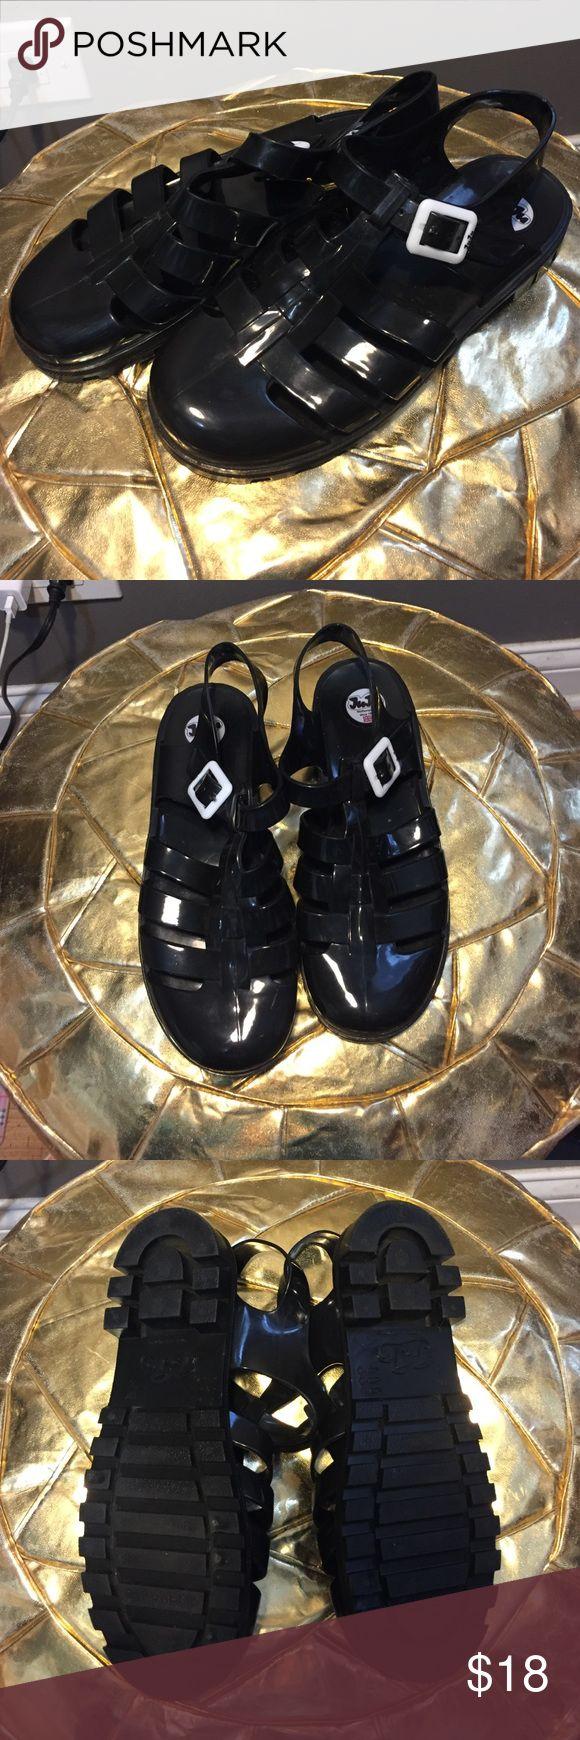 Jelly sandals Classic juju jelly sandals JuJu Shoes Sandals